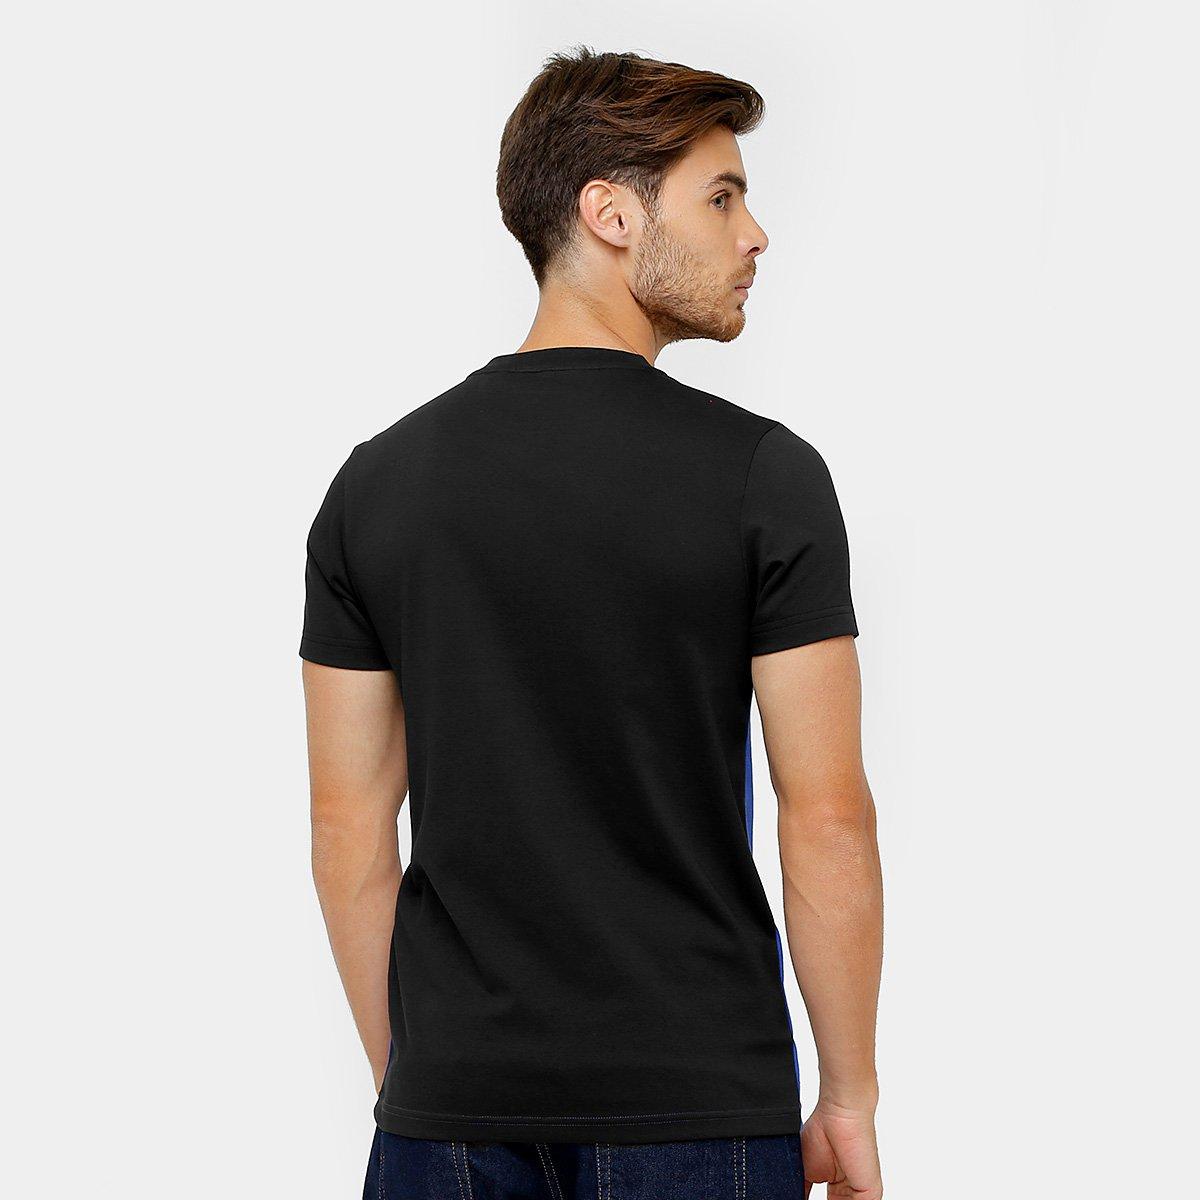 Camiseta Lacoste Sport Masculina  Camiseta Lacoste Sport Masculina ... 856051e4ae9ff